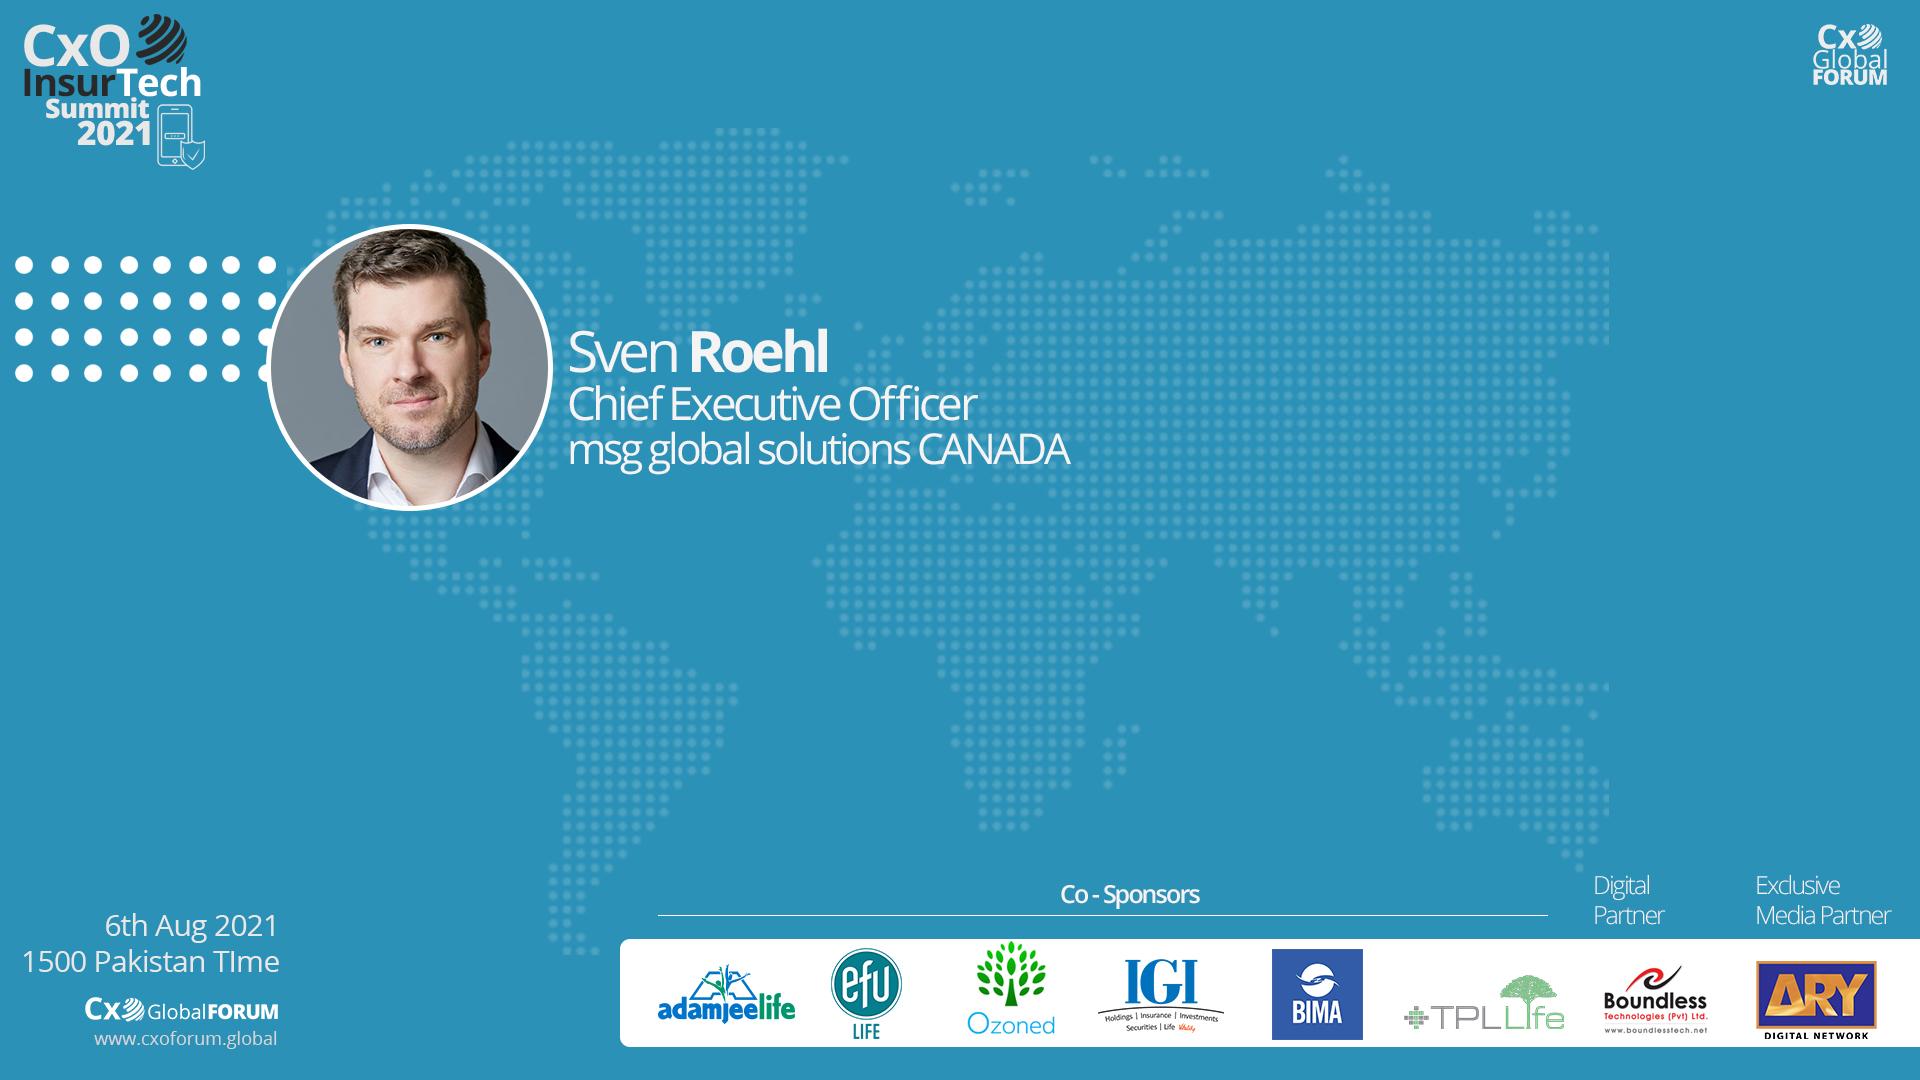 Presentation by Sven Roehl